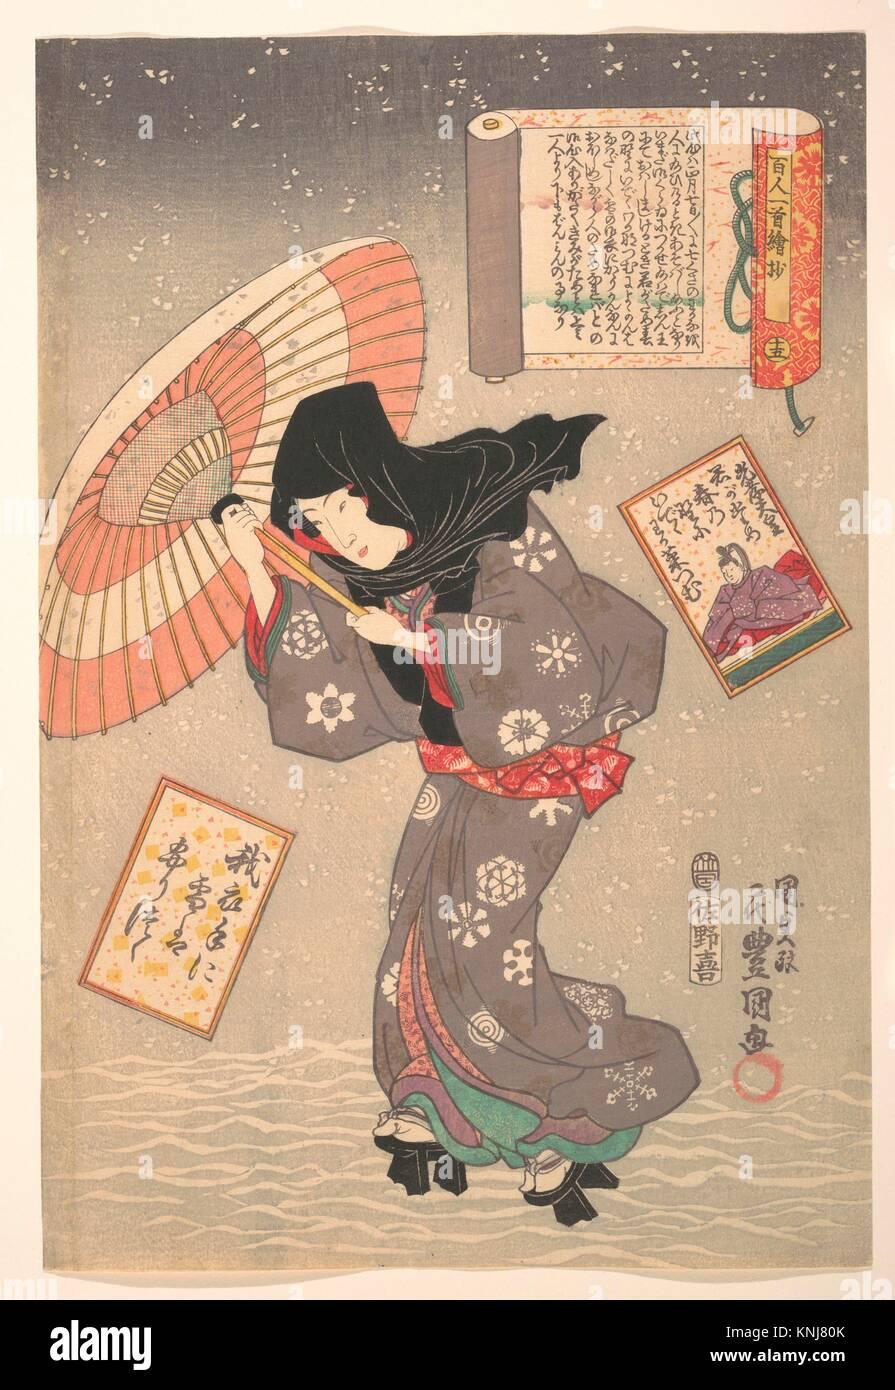 Selected Scenes from One Poem Each by One Hundred Poets: Poem by Emperor Koko. Artist: Utagawa Kunisada (Japanese, - Stock Image